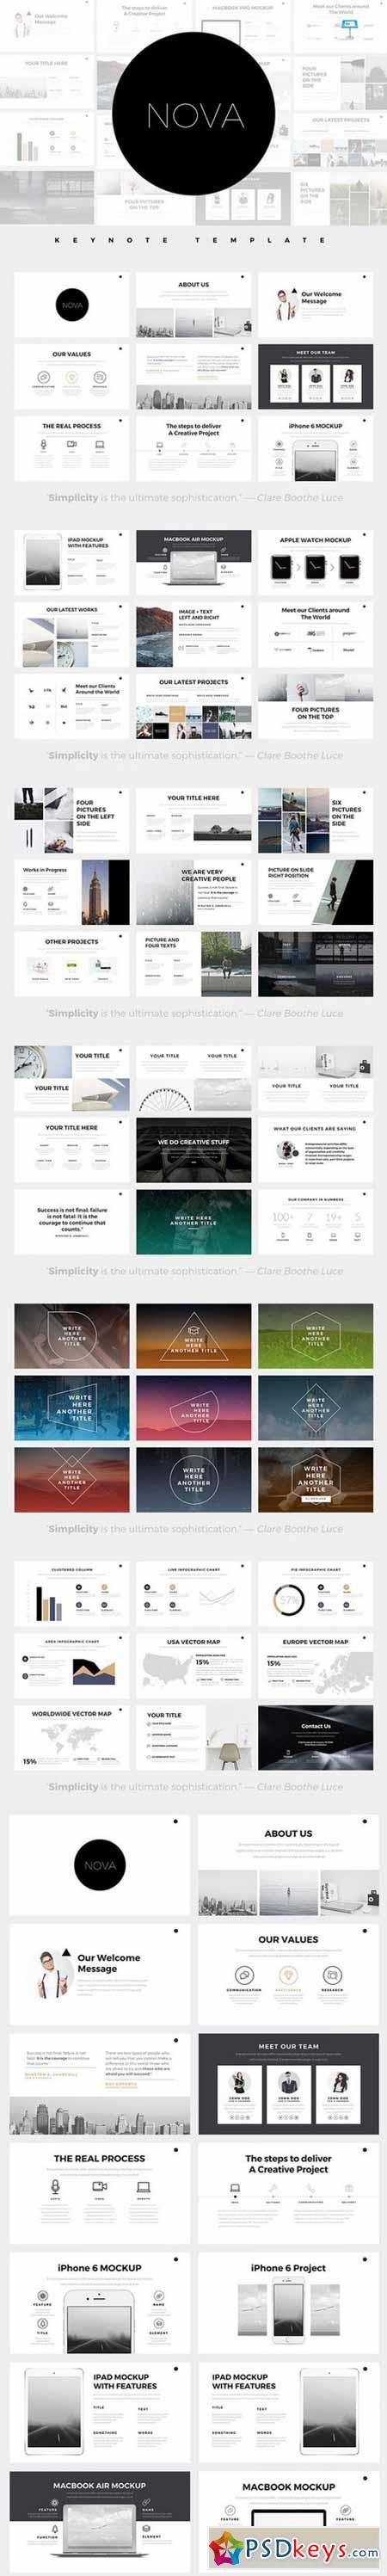 37 best images about Keynote Theme: Minimalist on Pinterest